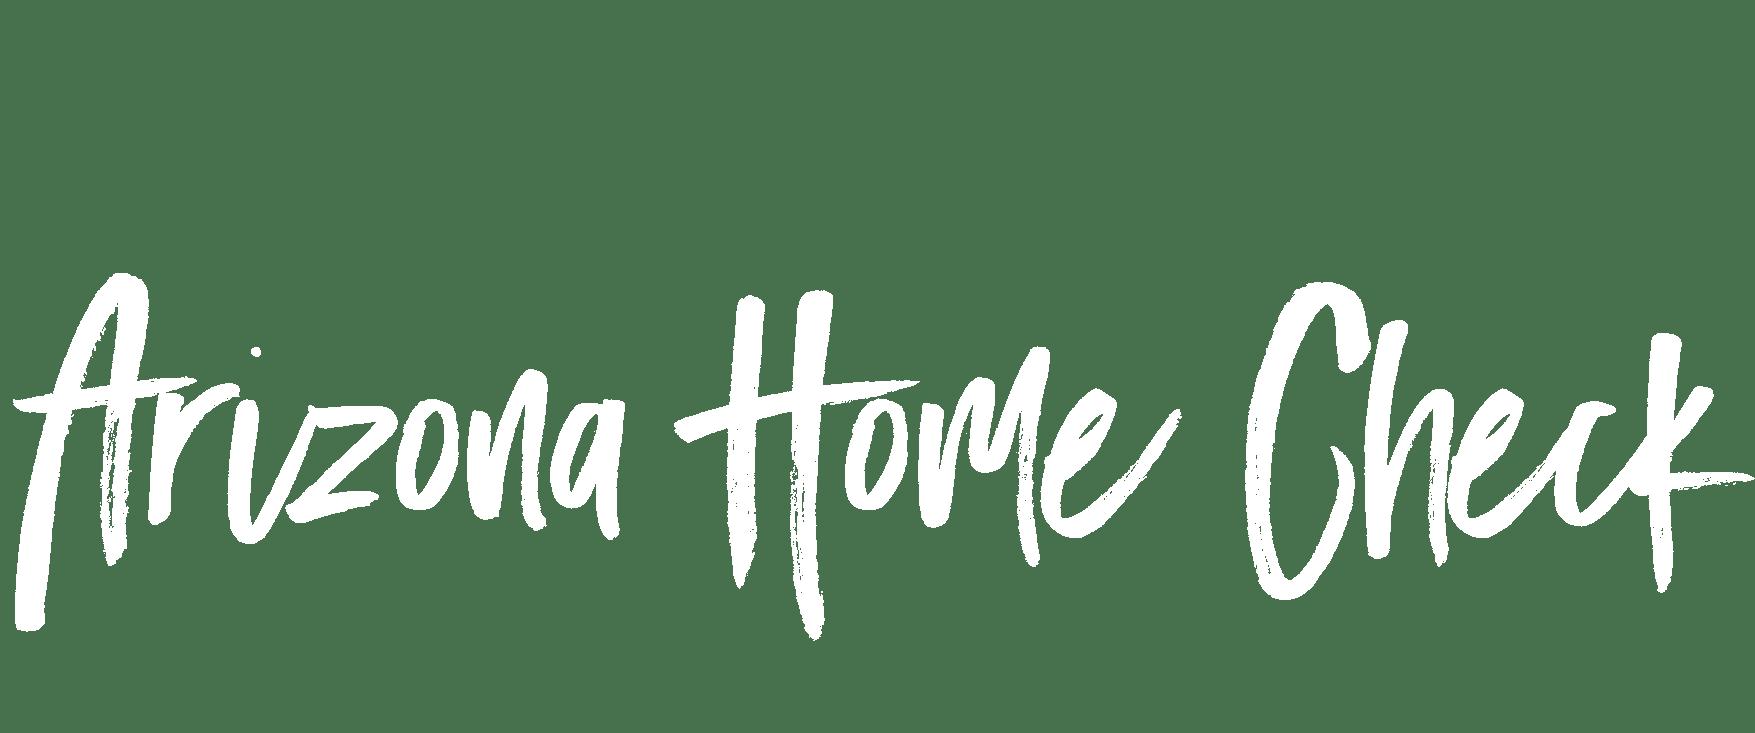 Arizona Home Check